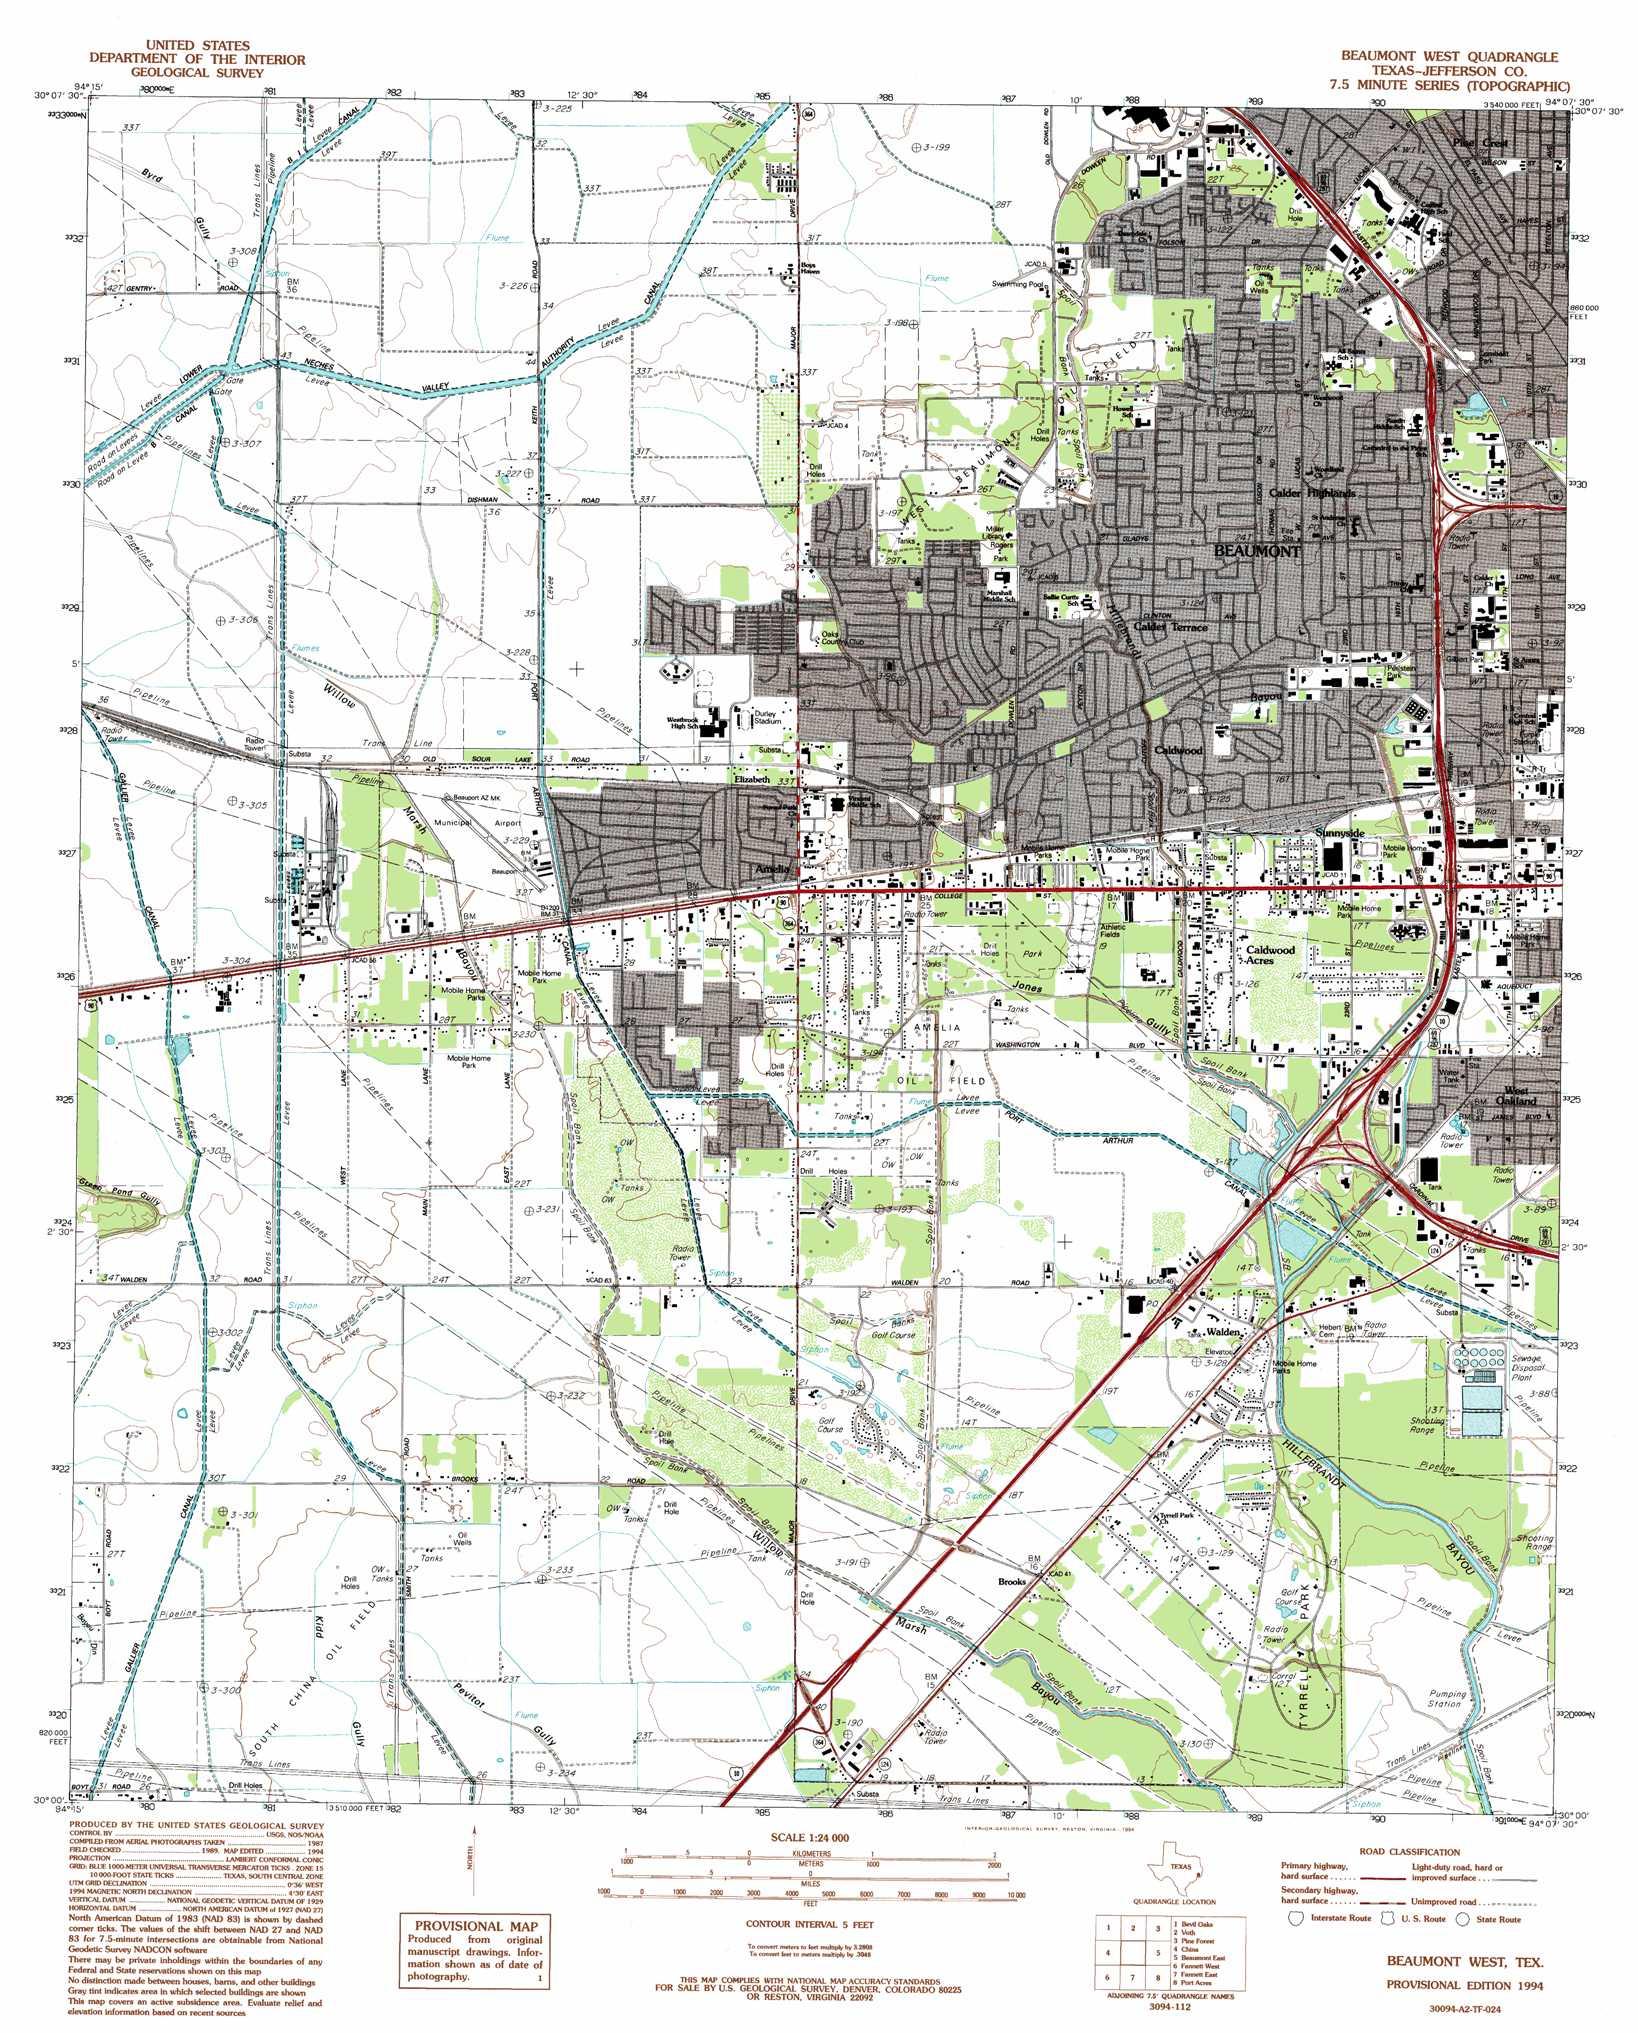 Beaumont west topographic map tx usgs topo quad 30094a2 for 3328 terrace nederland tx